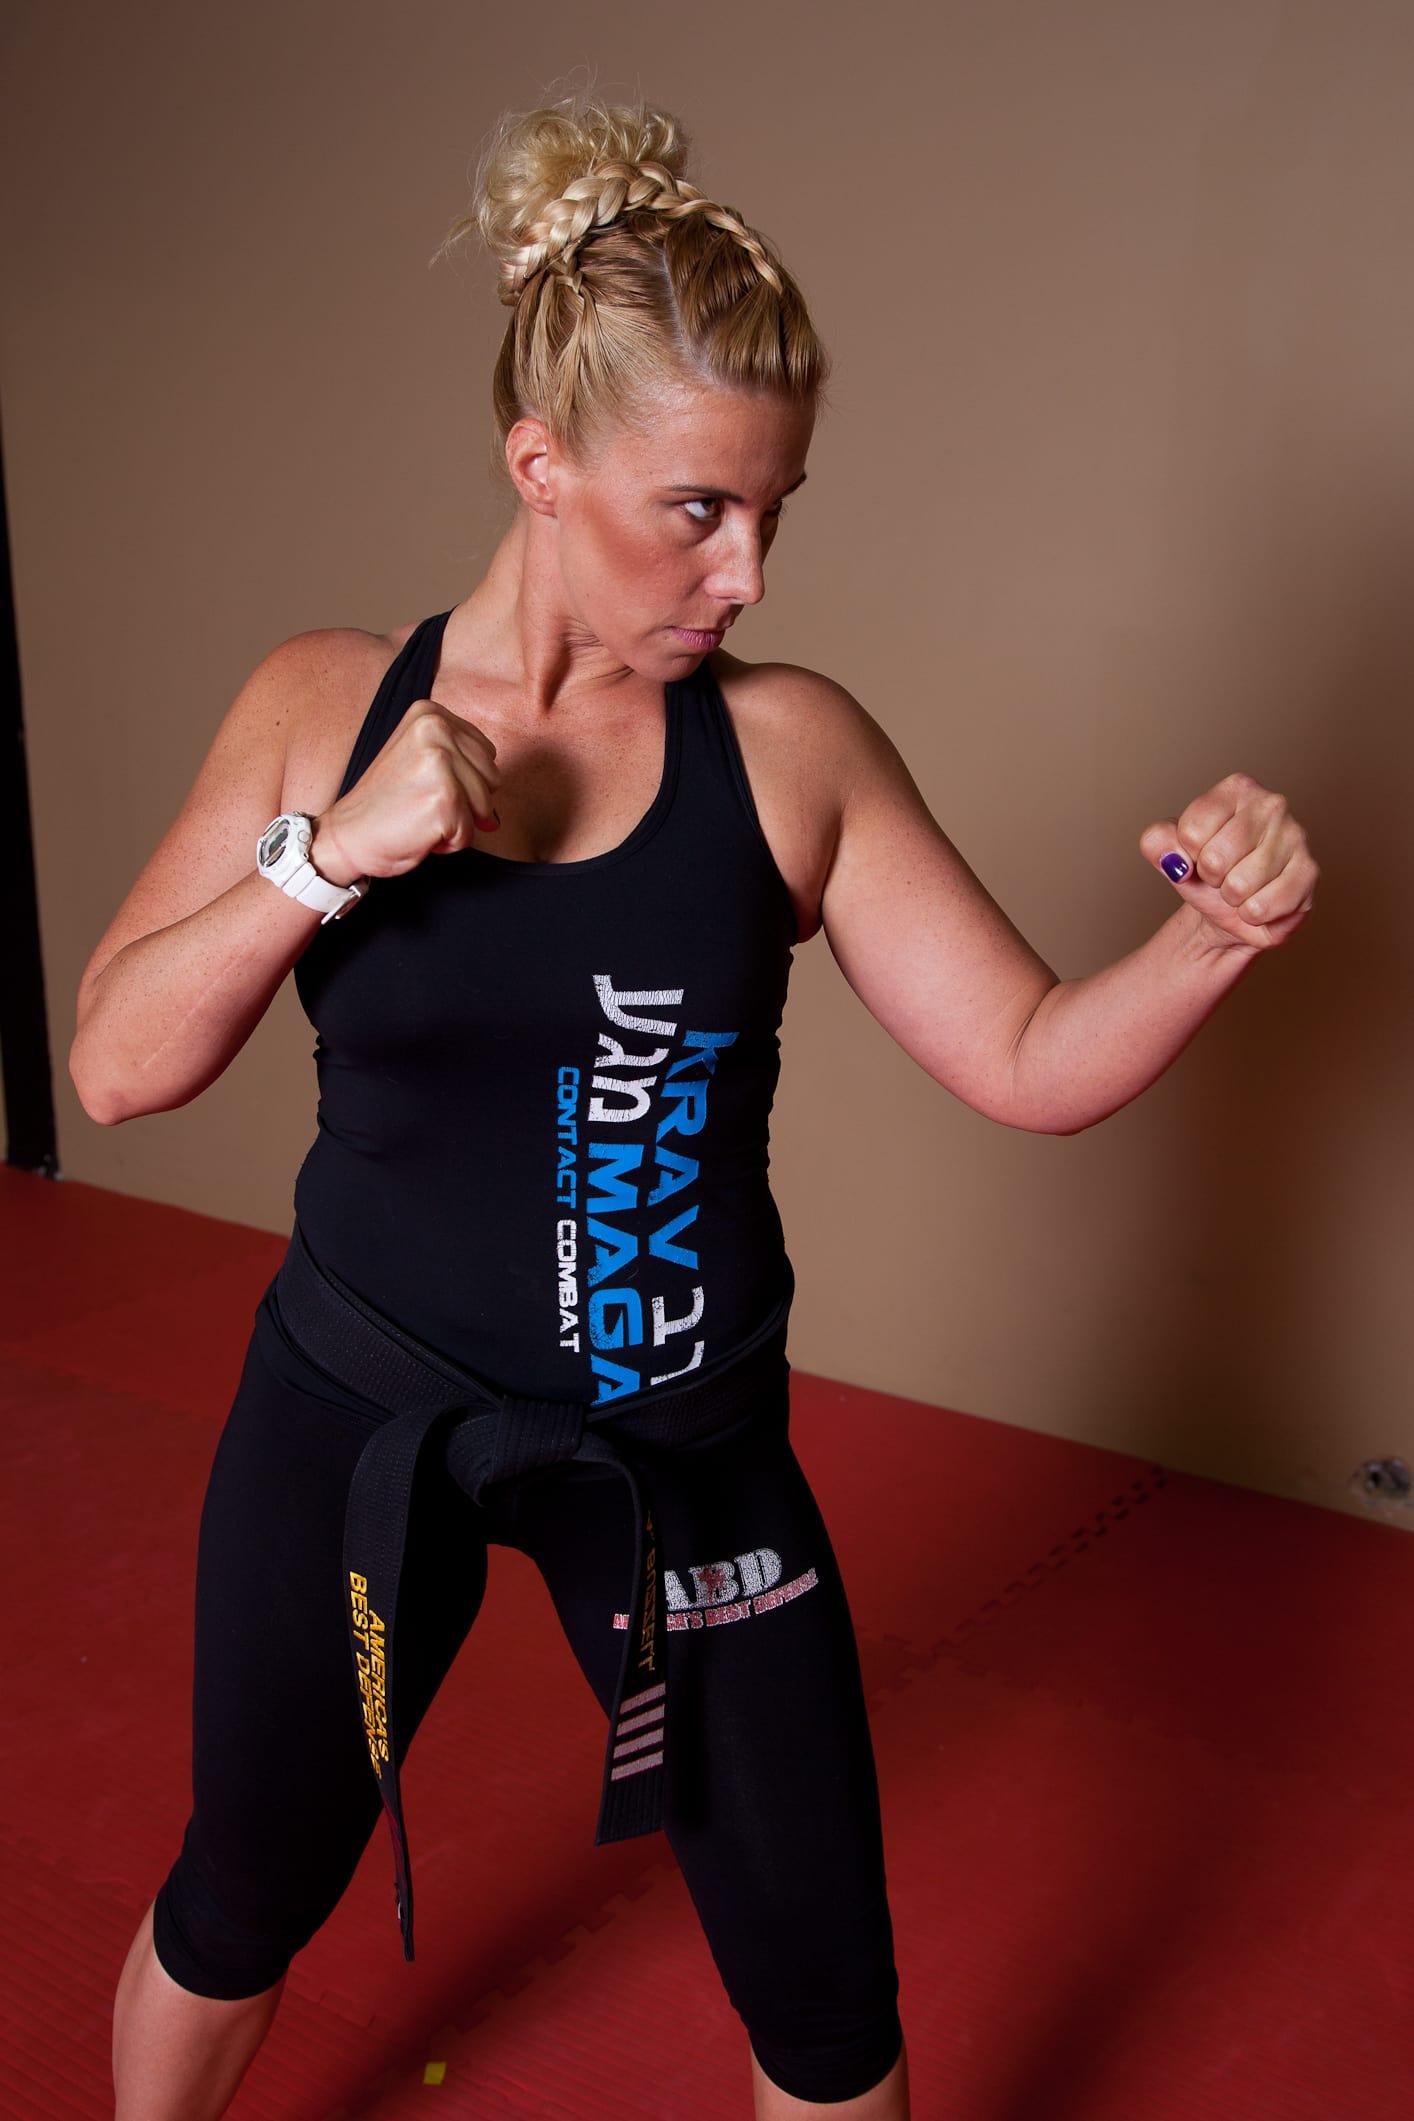 Alexandria J Dimond in Rhode Island - Burke's Martial Arts